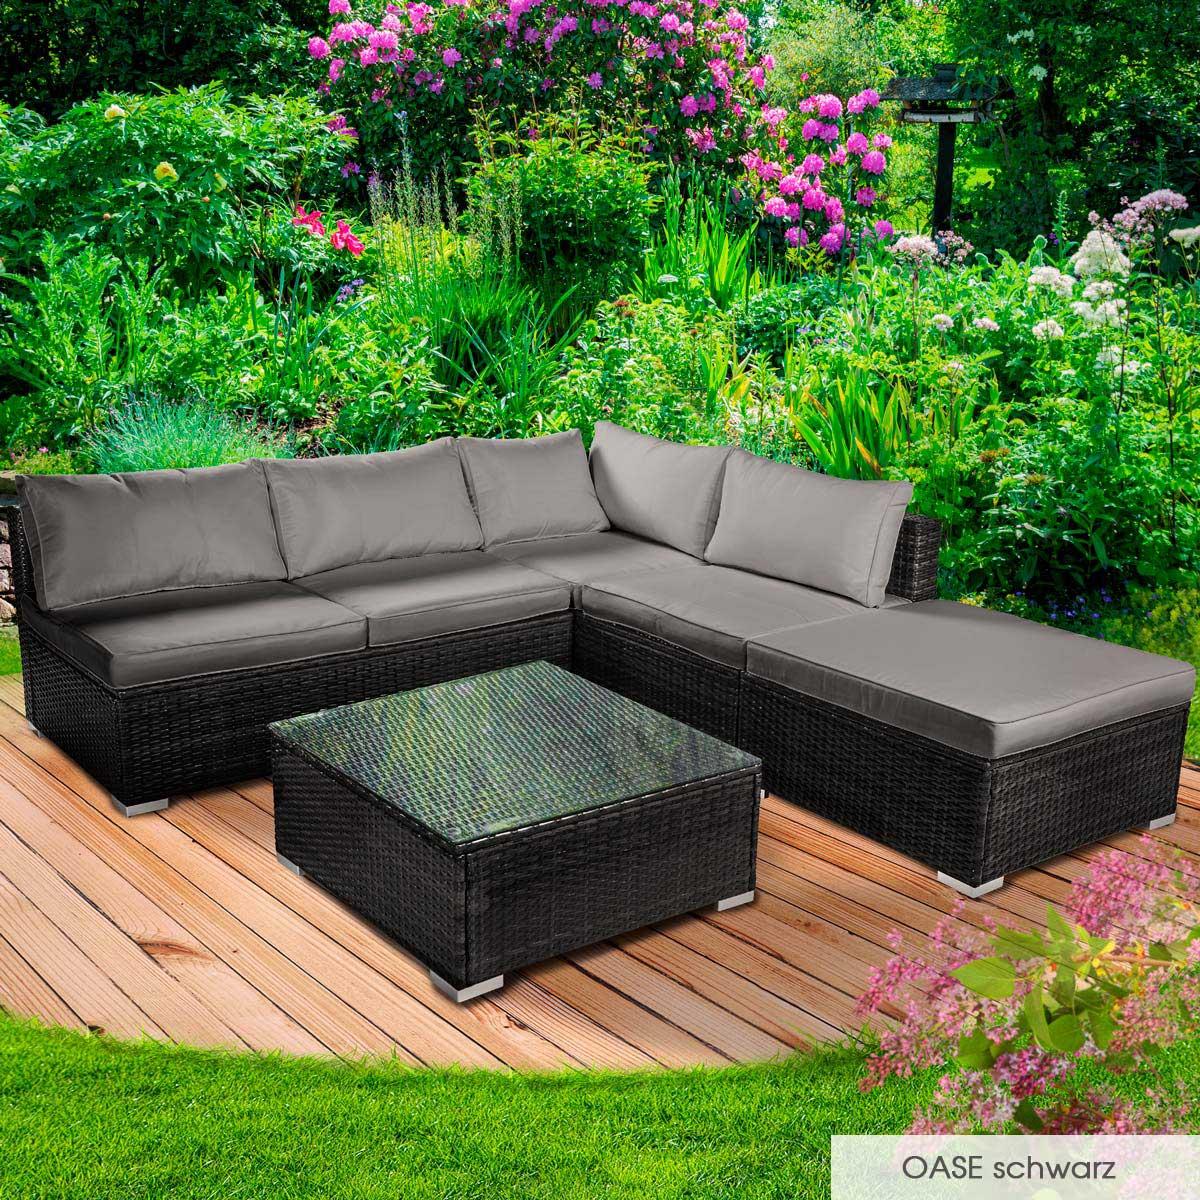 Gartenmoebel-Poly-Rattan-Lounge-Moebel-Sitzgarnitur-Gartengarnitur-Sitzgruppe-Sofa Indexbild 16